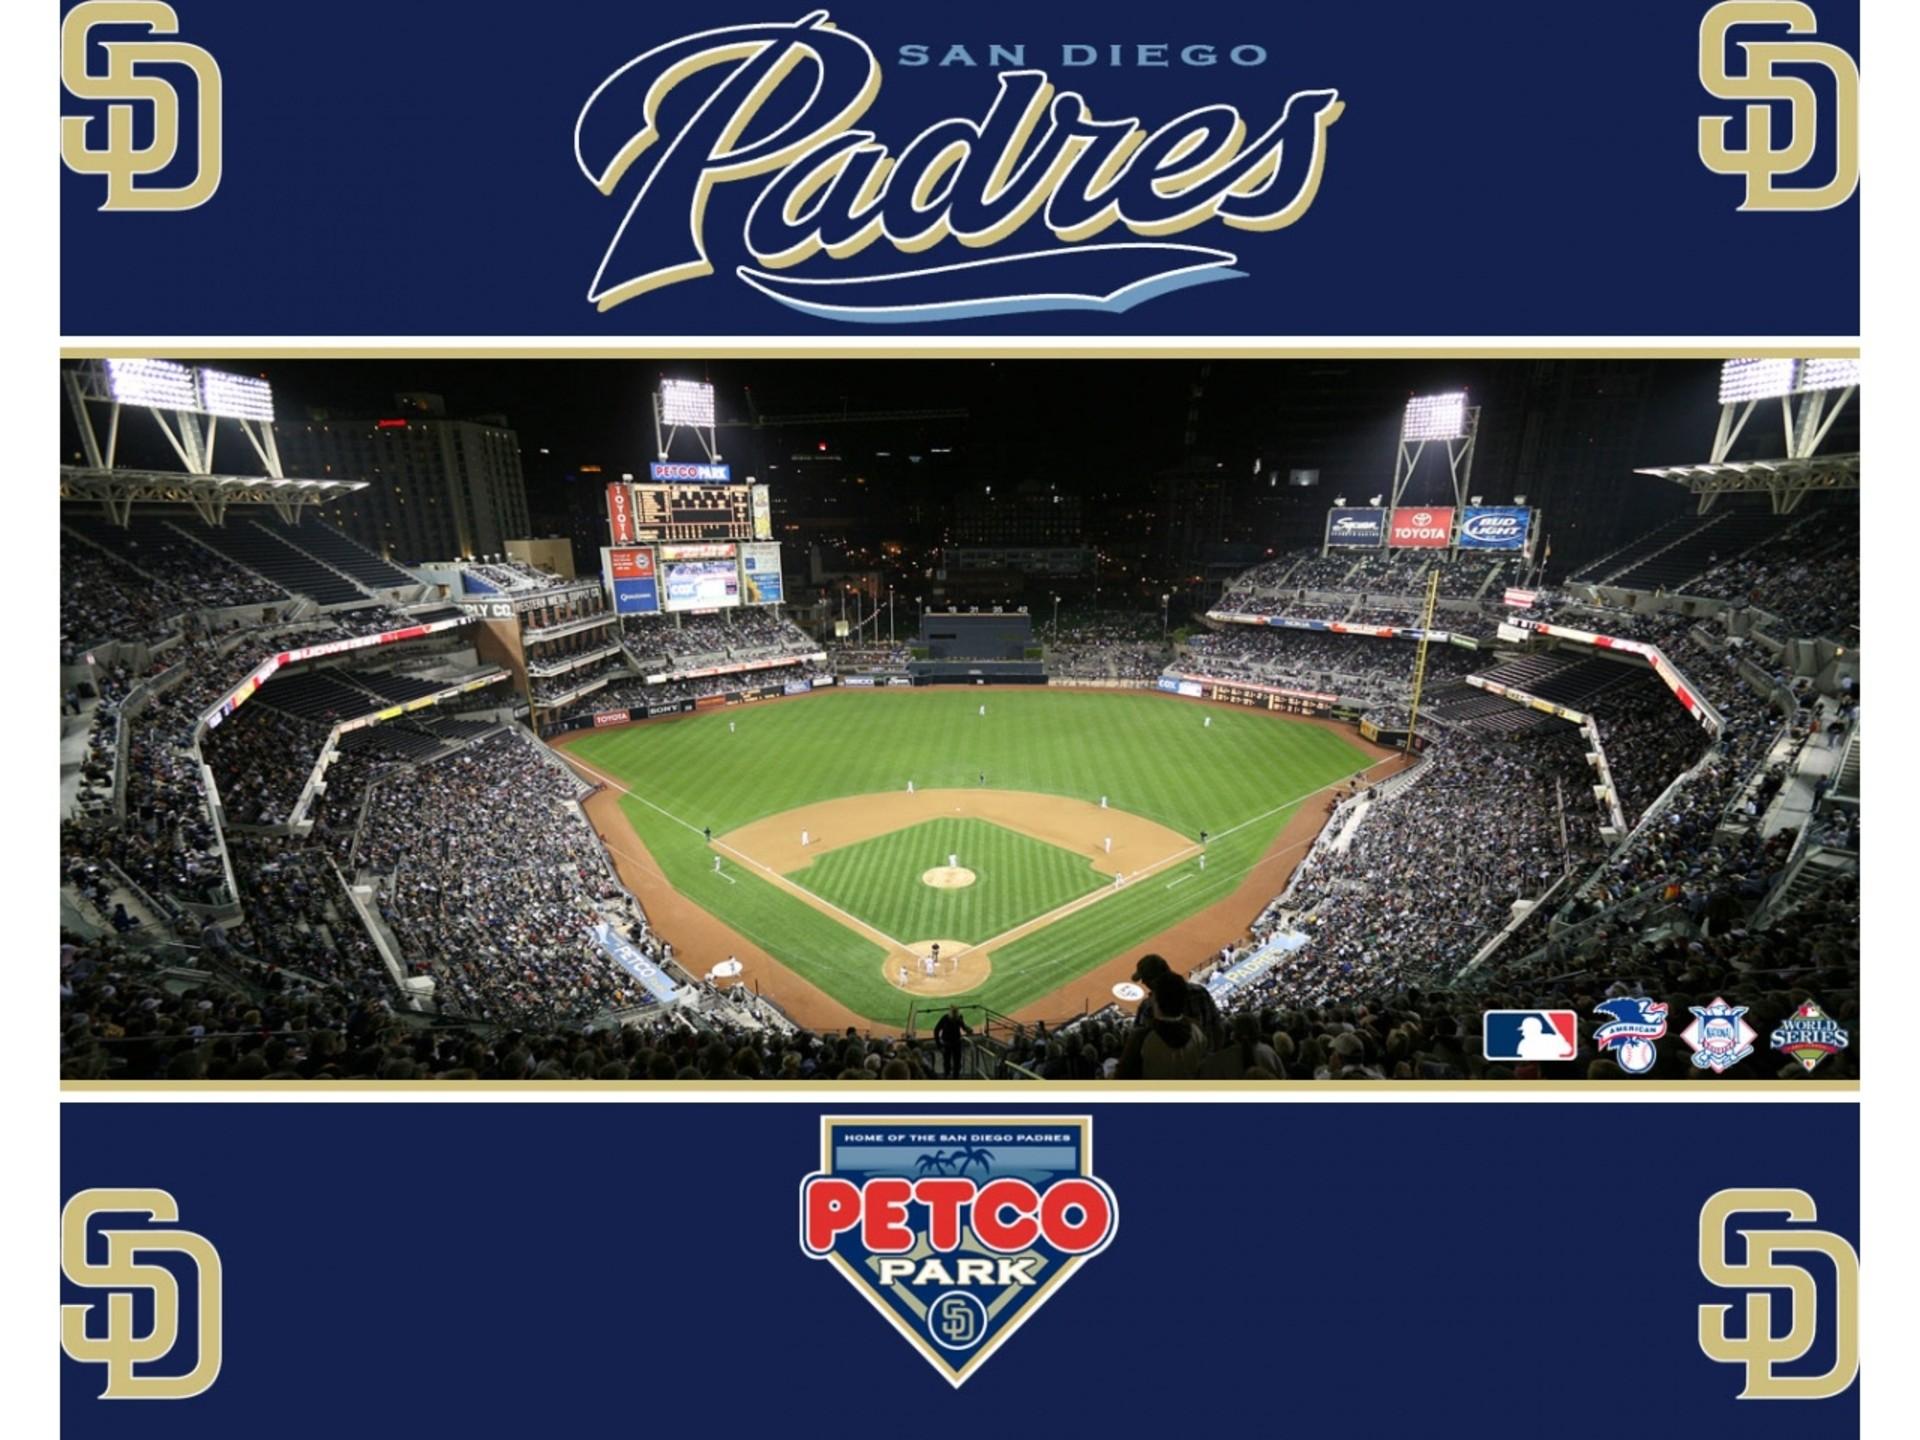 SAN DIEGO PADRES mlb baseball (21) wallpaper | | 231837 |  WallpaperUP